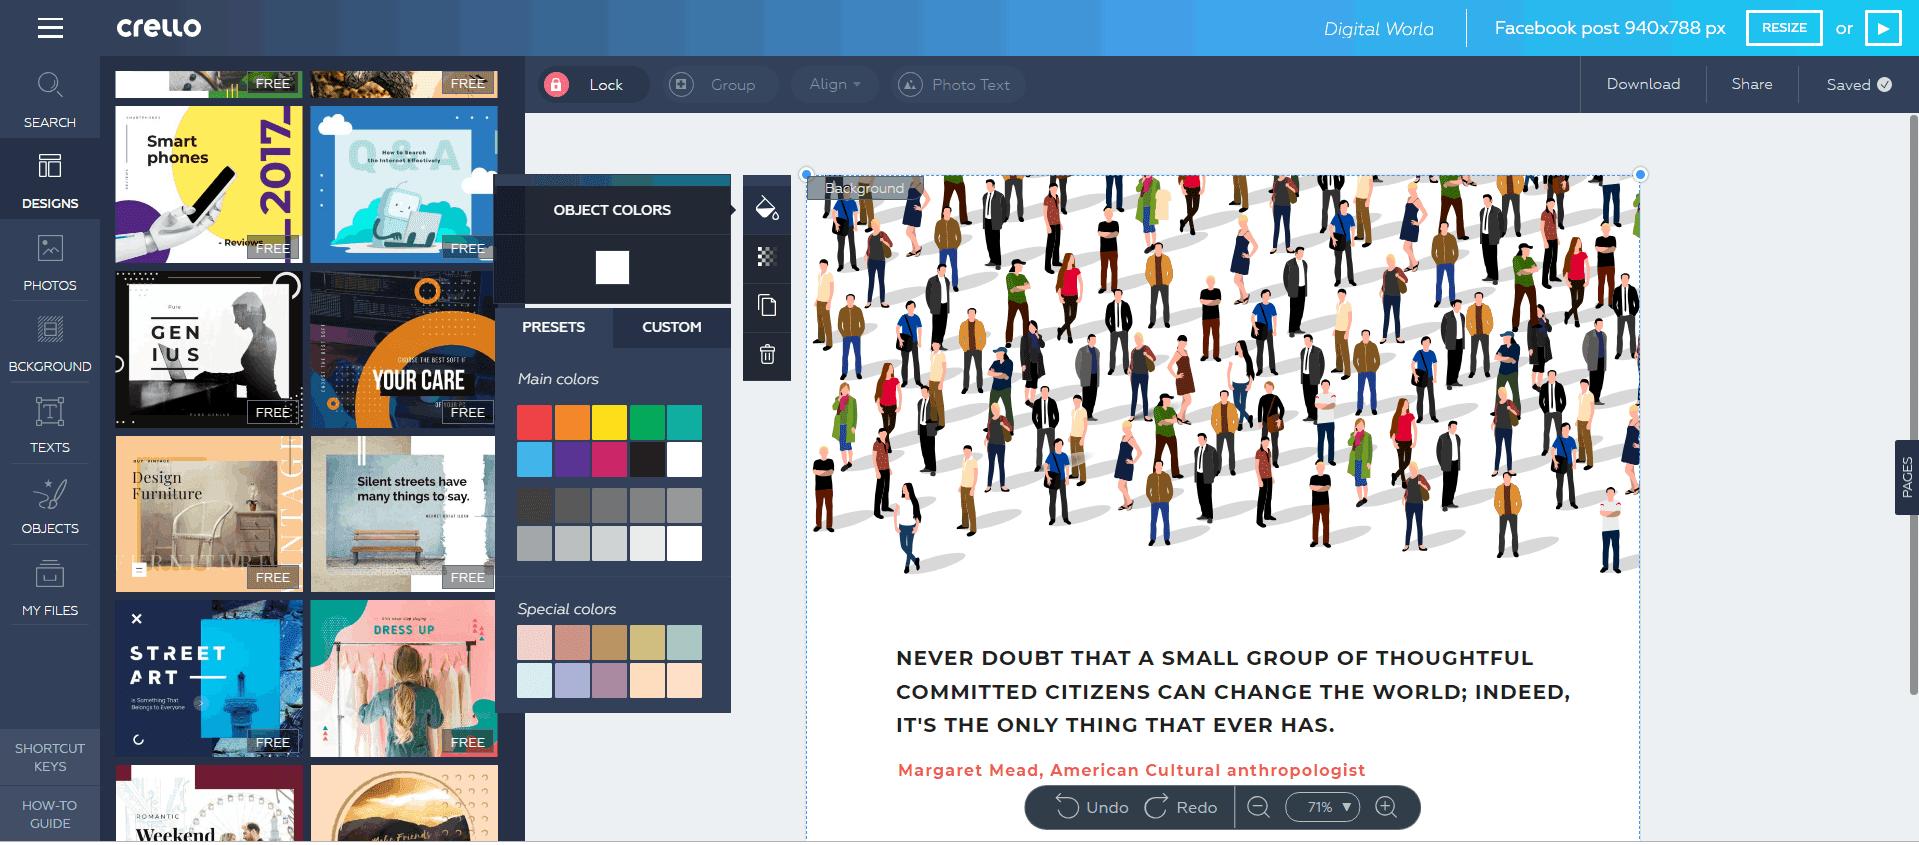 Online Visual Editor Crello Shares Growth Story / Digital